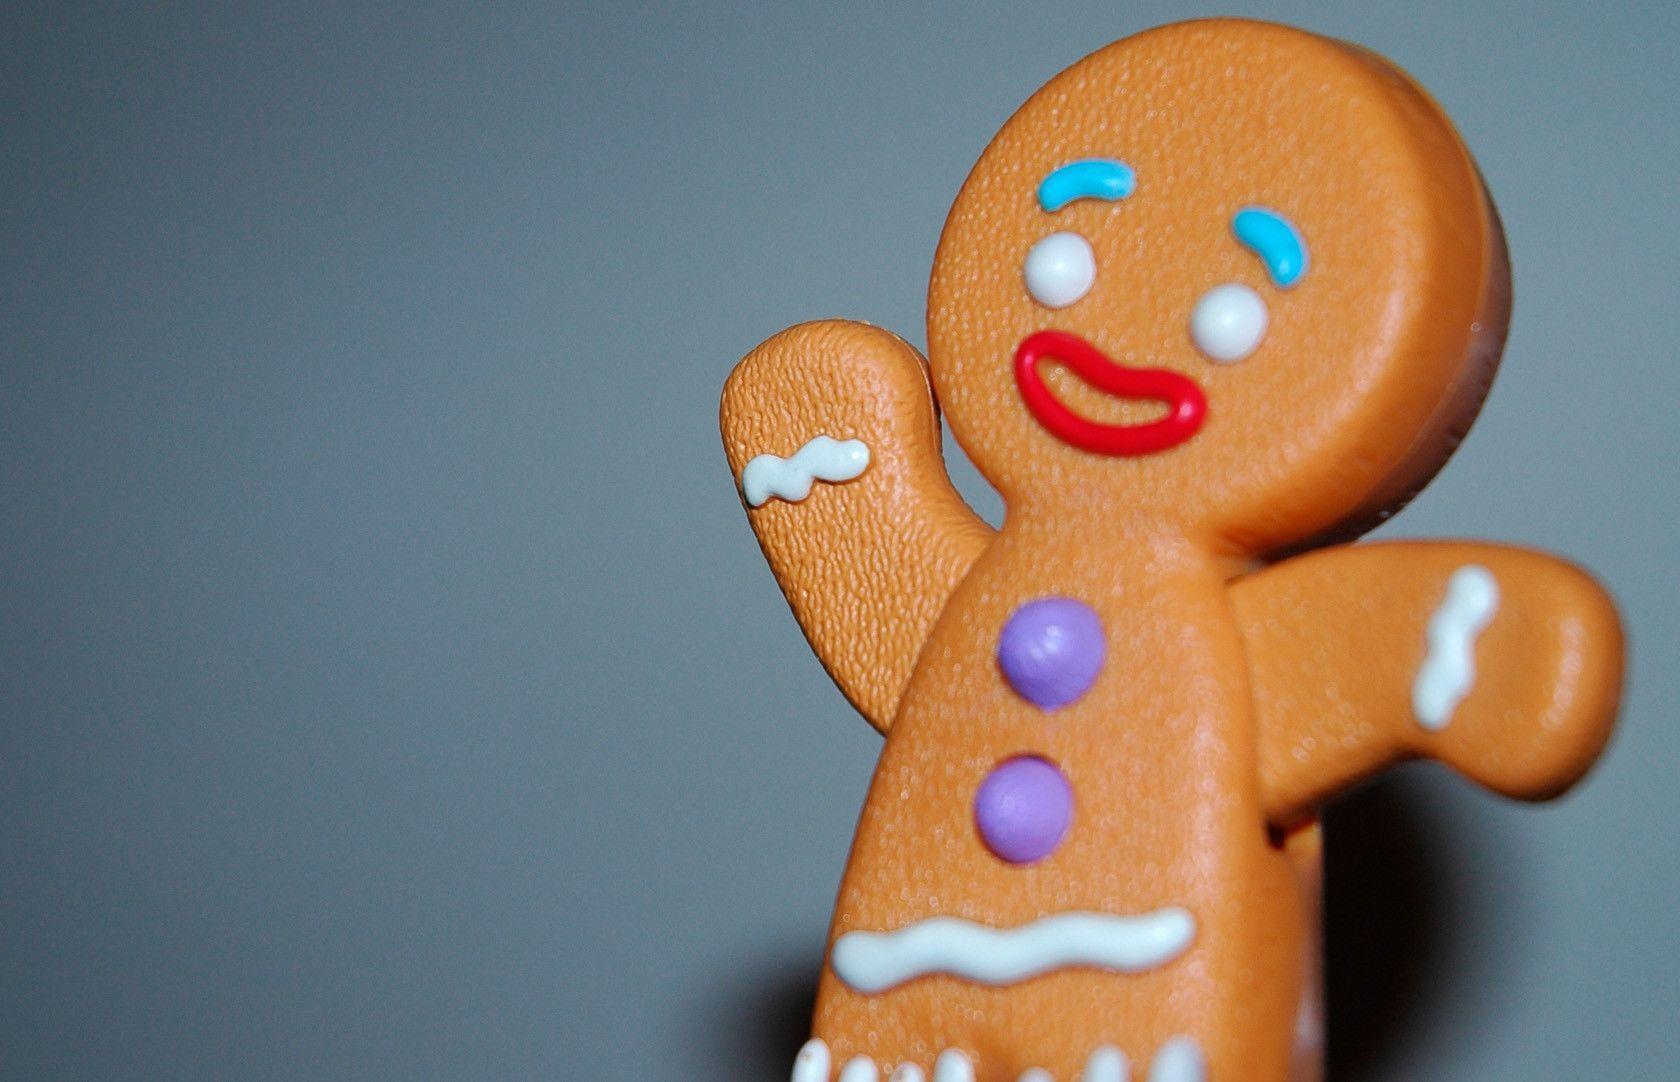 Gingerbread Man Wallpapers - Wallpaper - 147.0KB